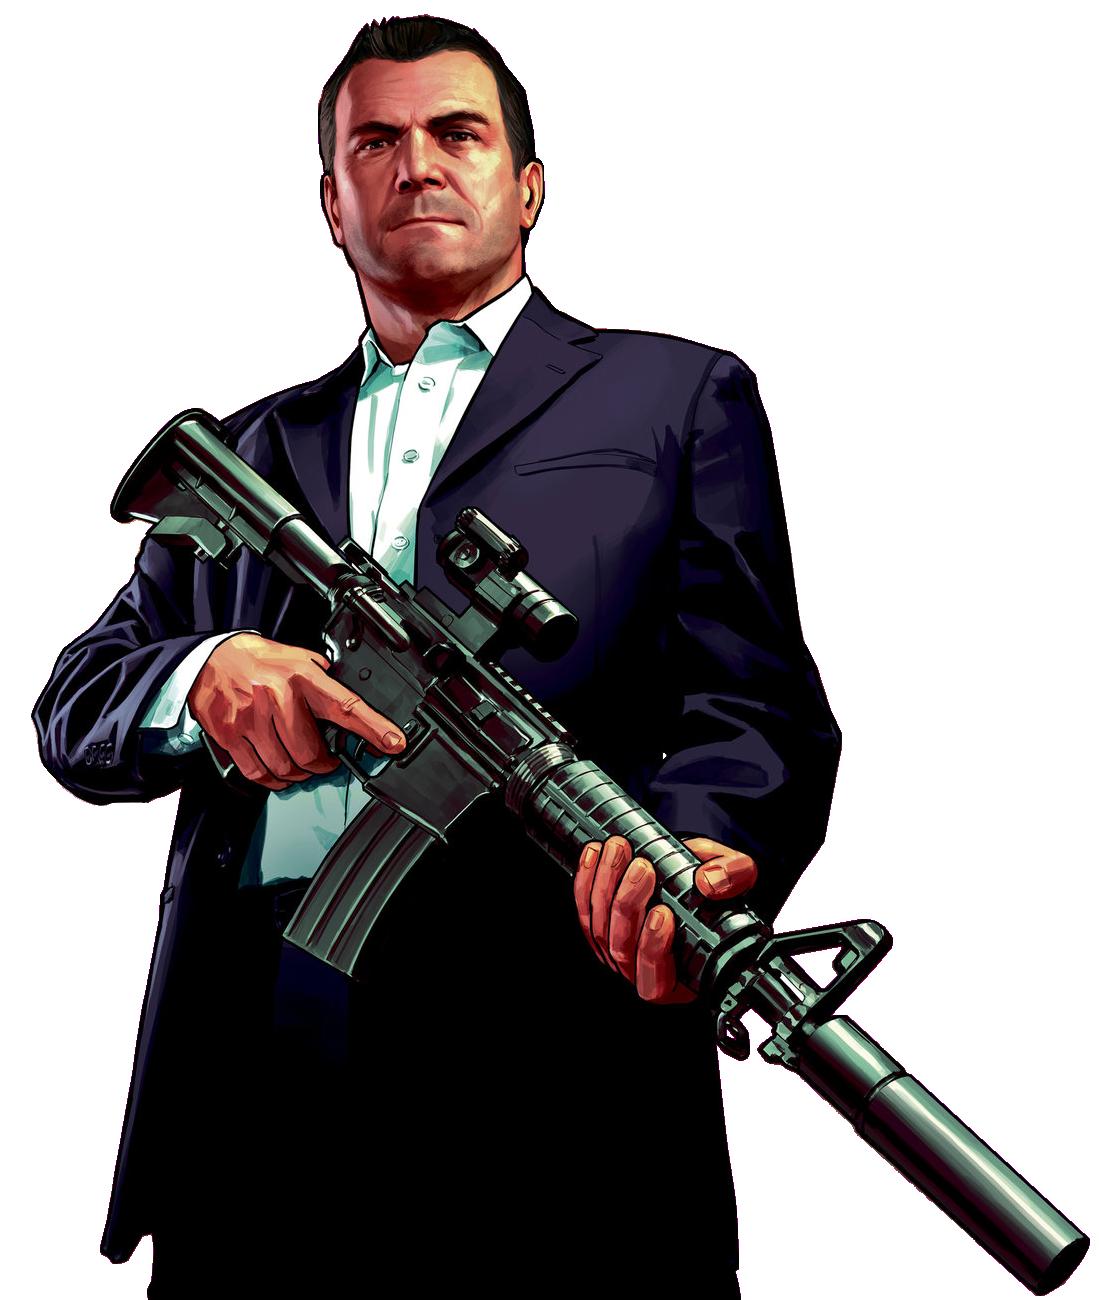 Gta 5 Michael Grand Theft Auto Grand Theft Auto Artwork Gta 5